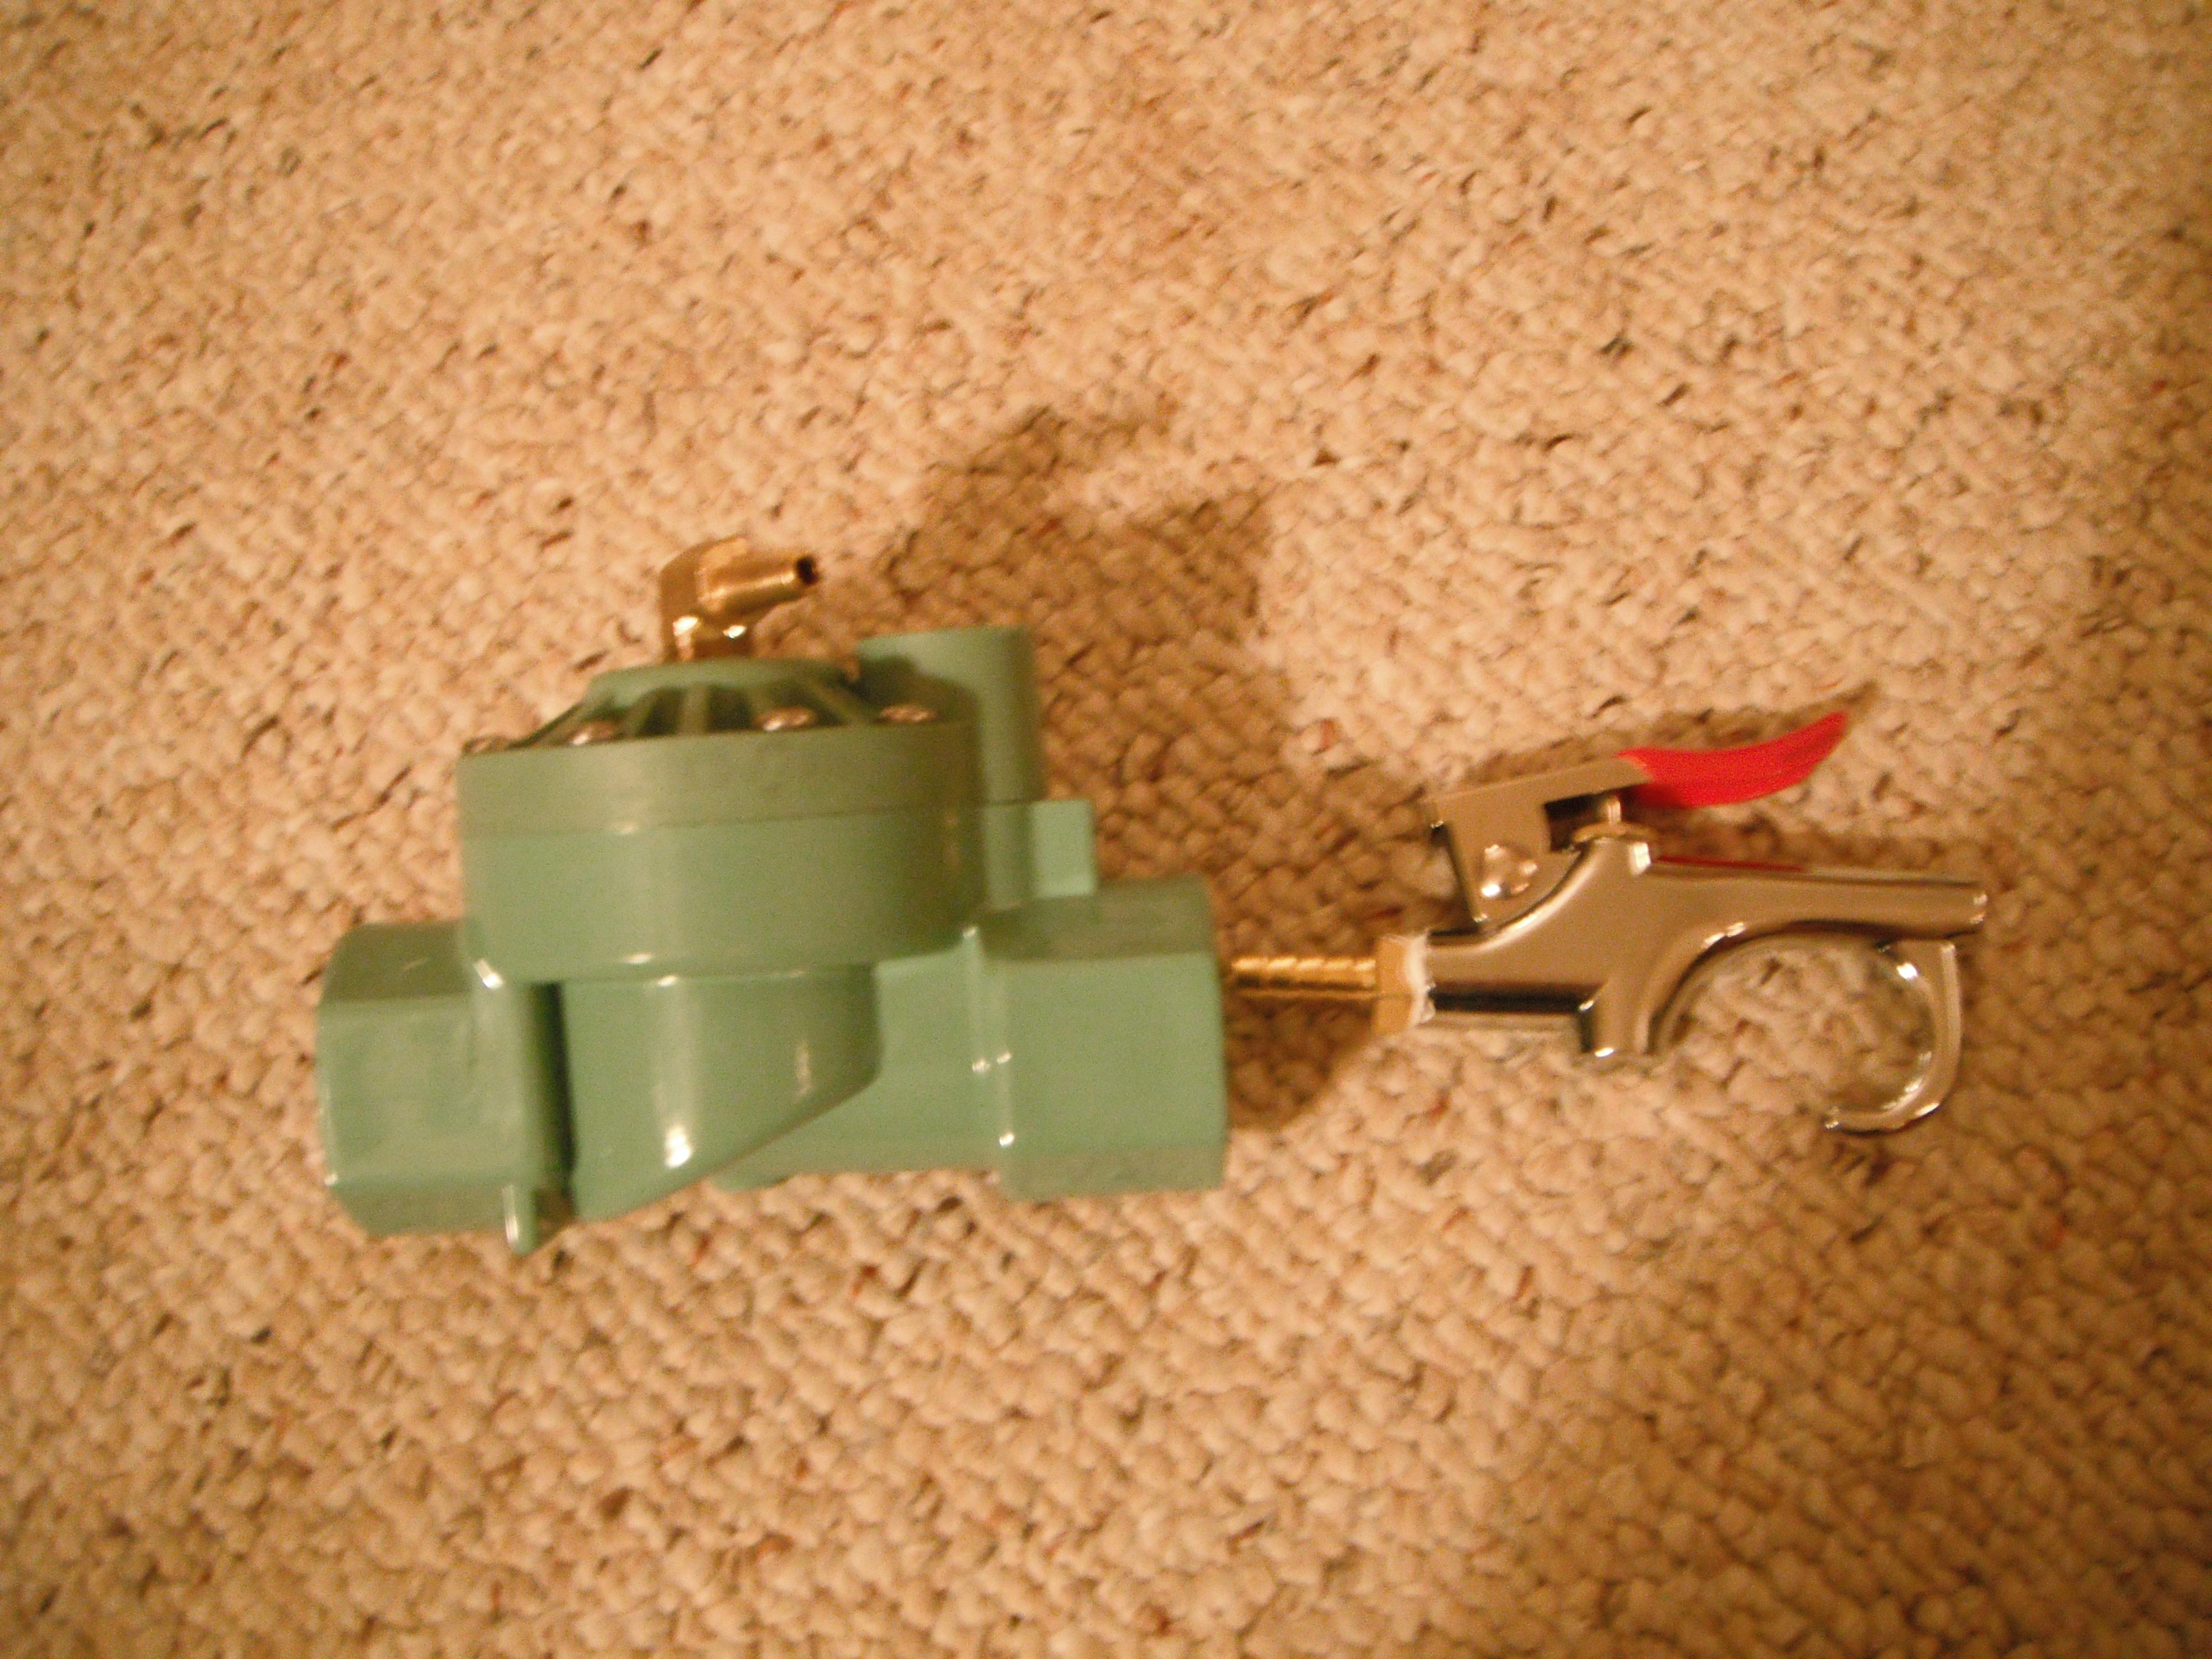 Picture of Adding the Sprinkler Valve & Stock